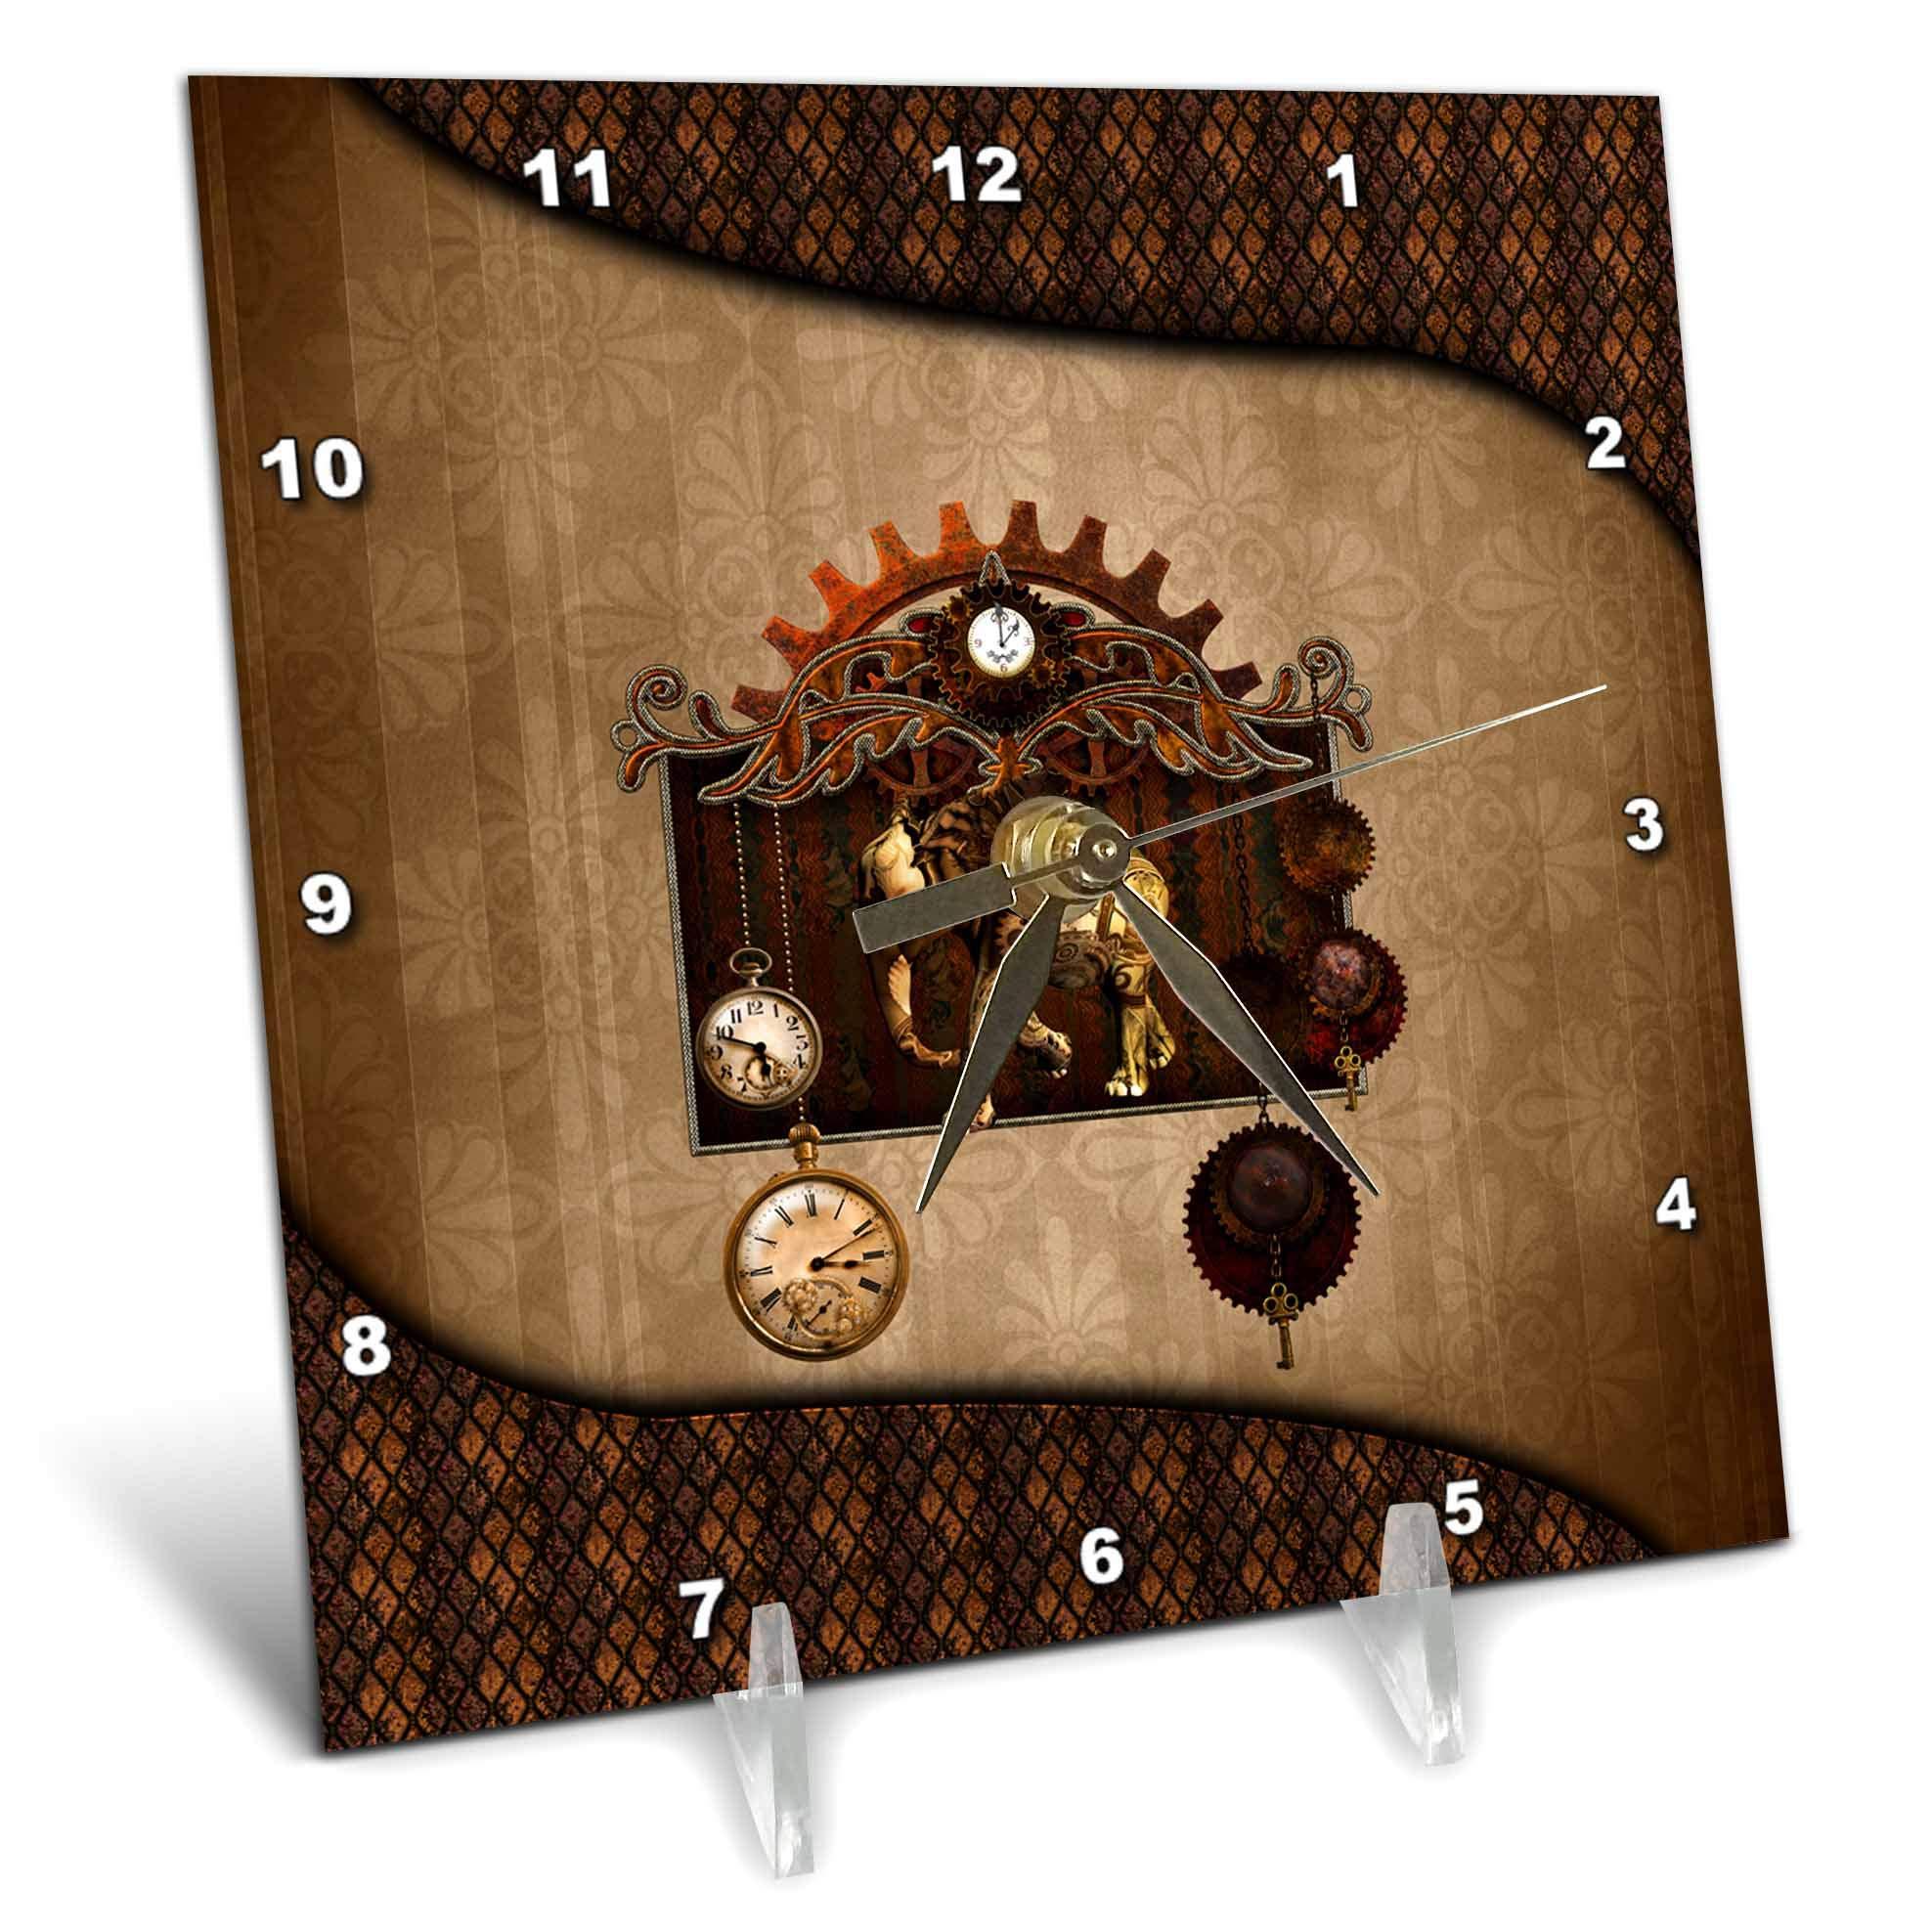 3dRose Heike Köhnen Design Steampunk - Awesome steampunk elephant clocks and gears - 6x6 Desk Clock (dc_289170_1)